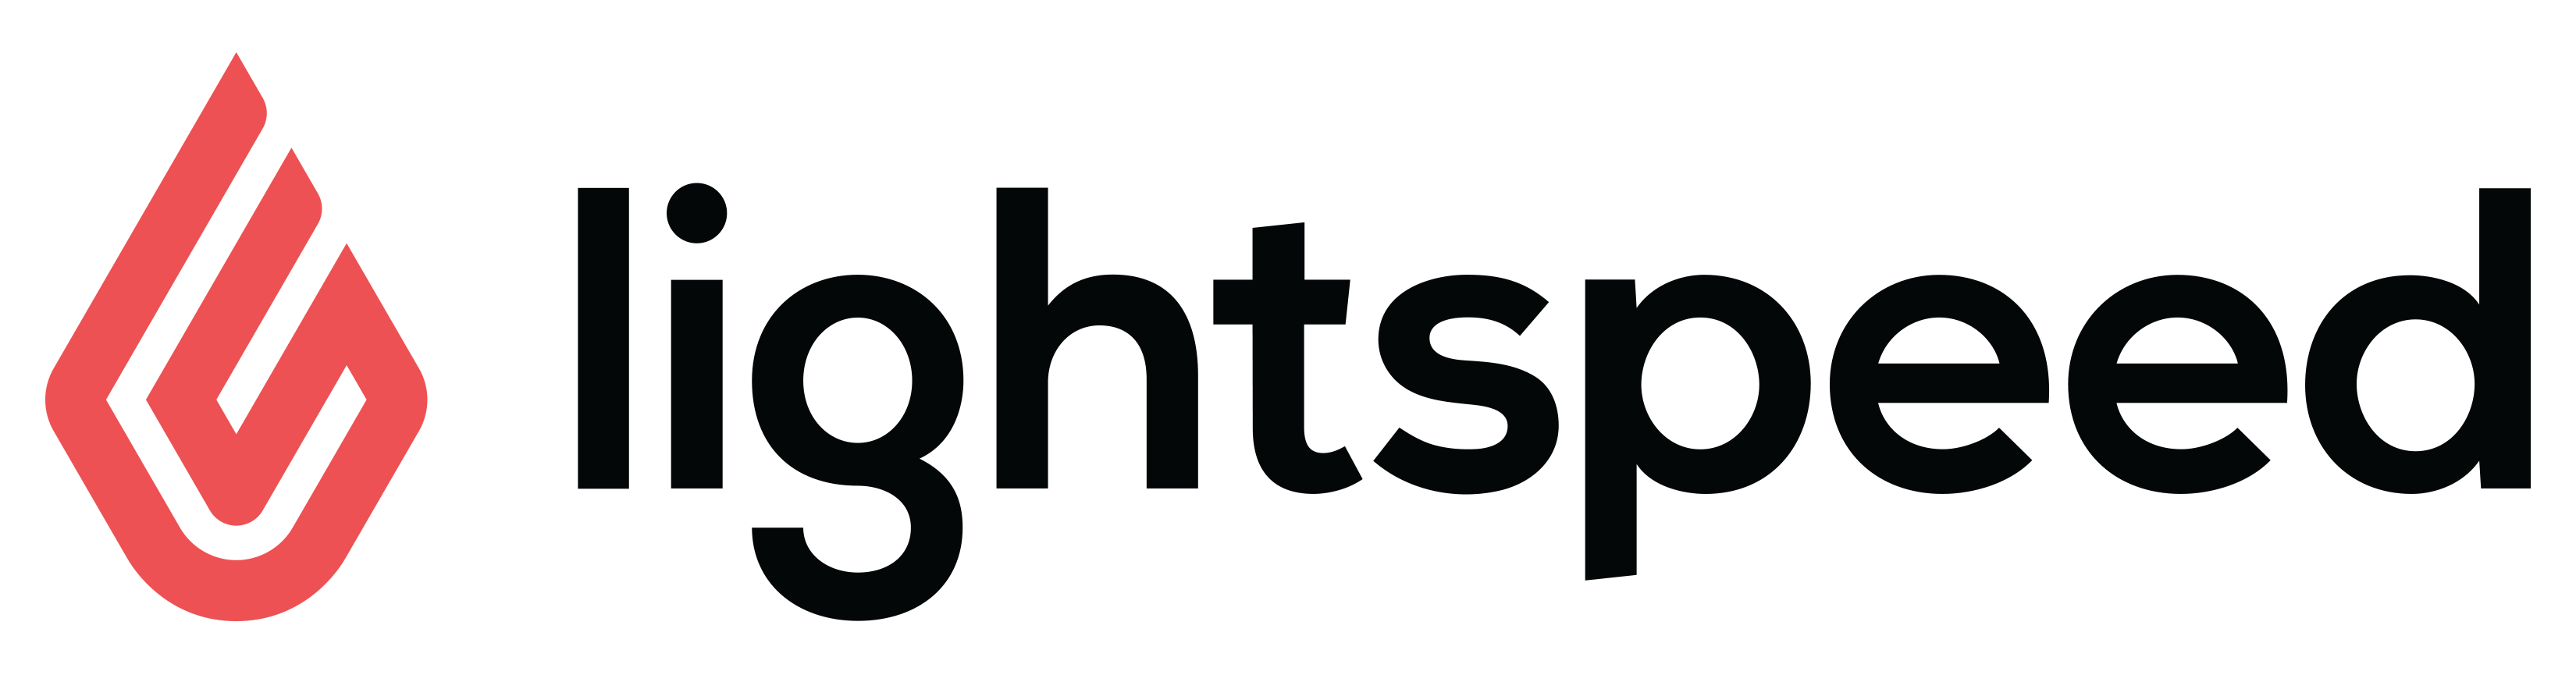 Lightspeed Horeca Kassa software